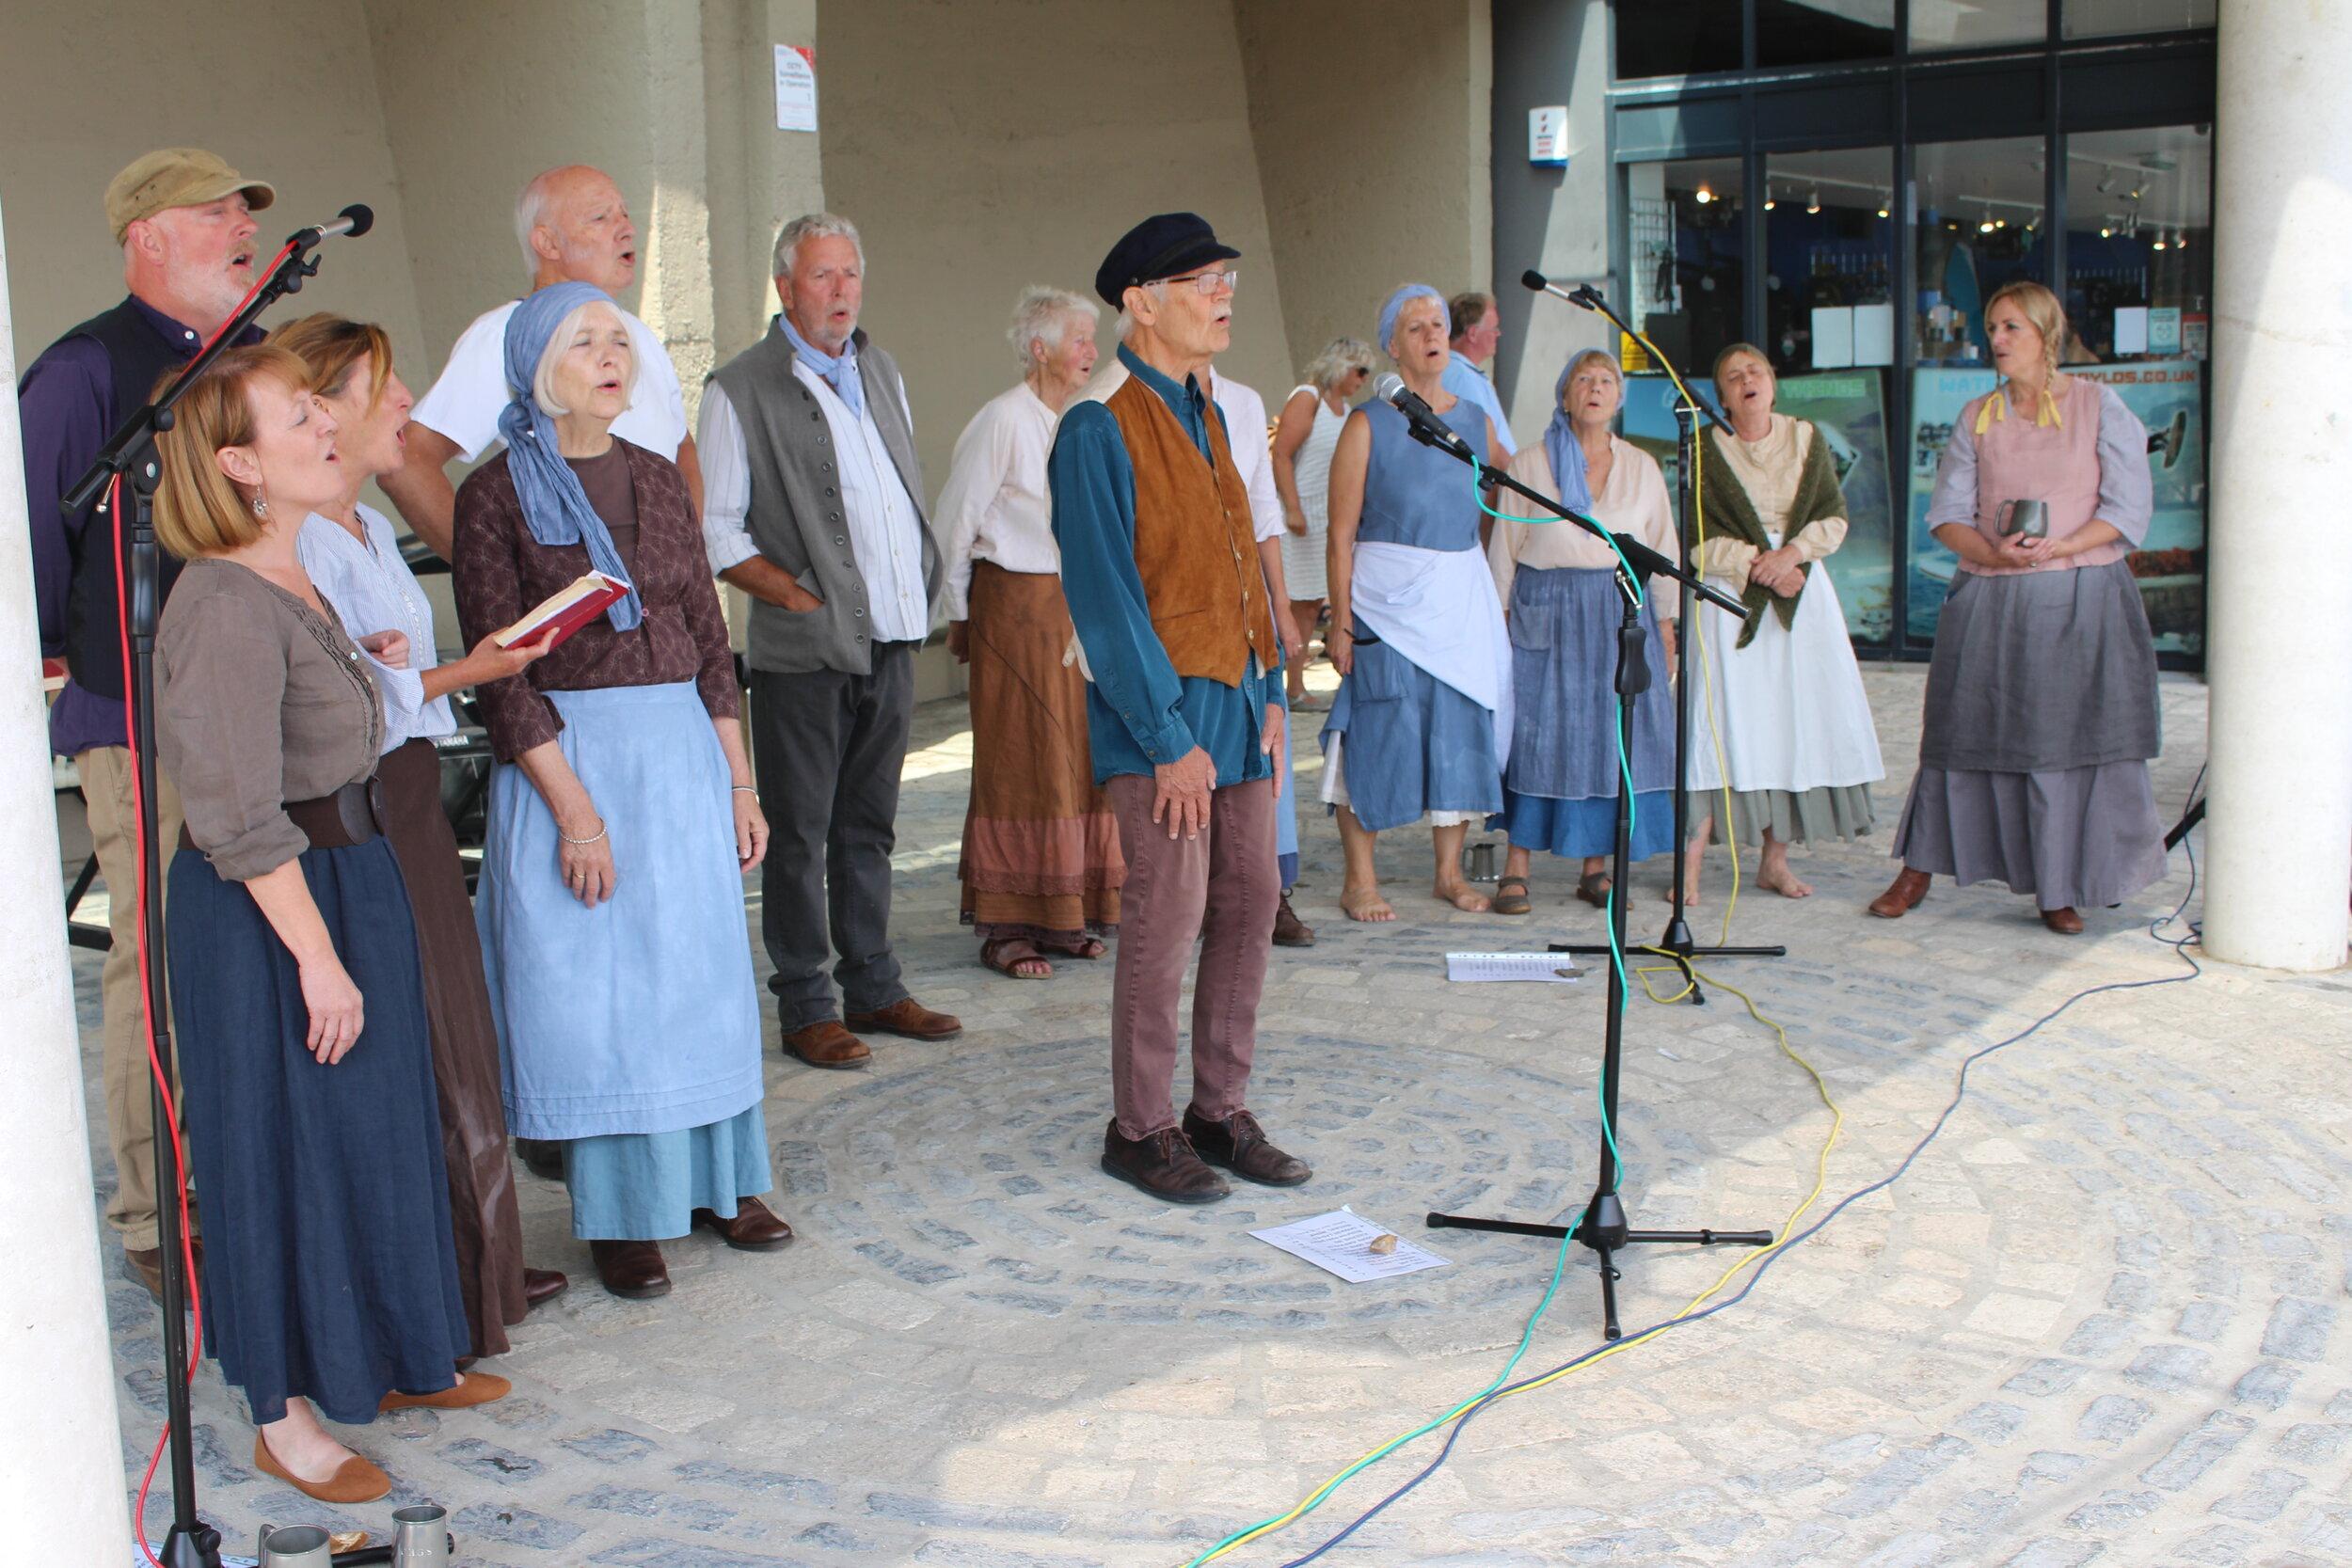 Singing at the Lyme Regis Folk Festival 2019